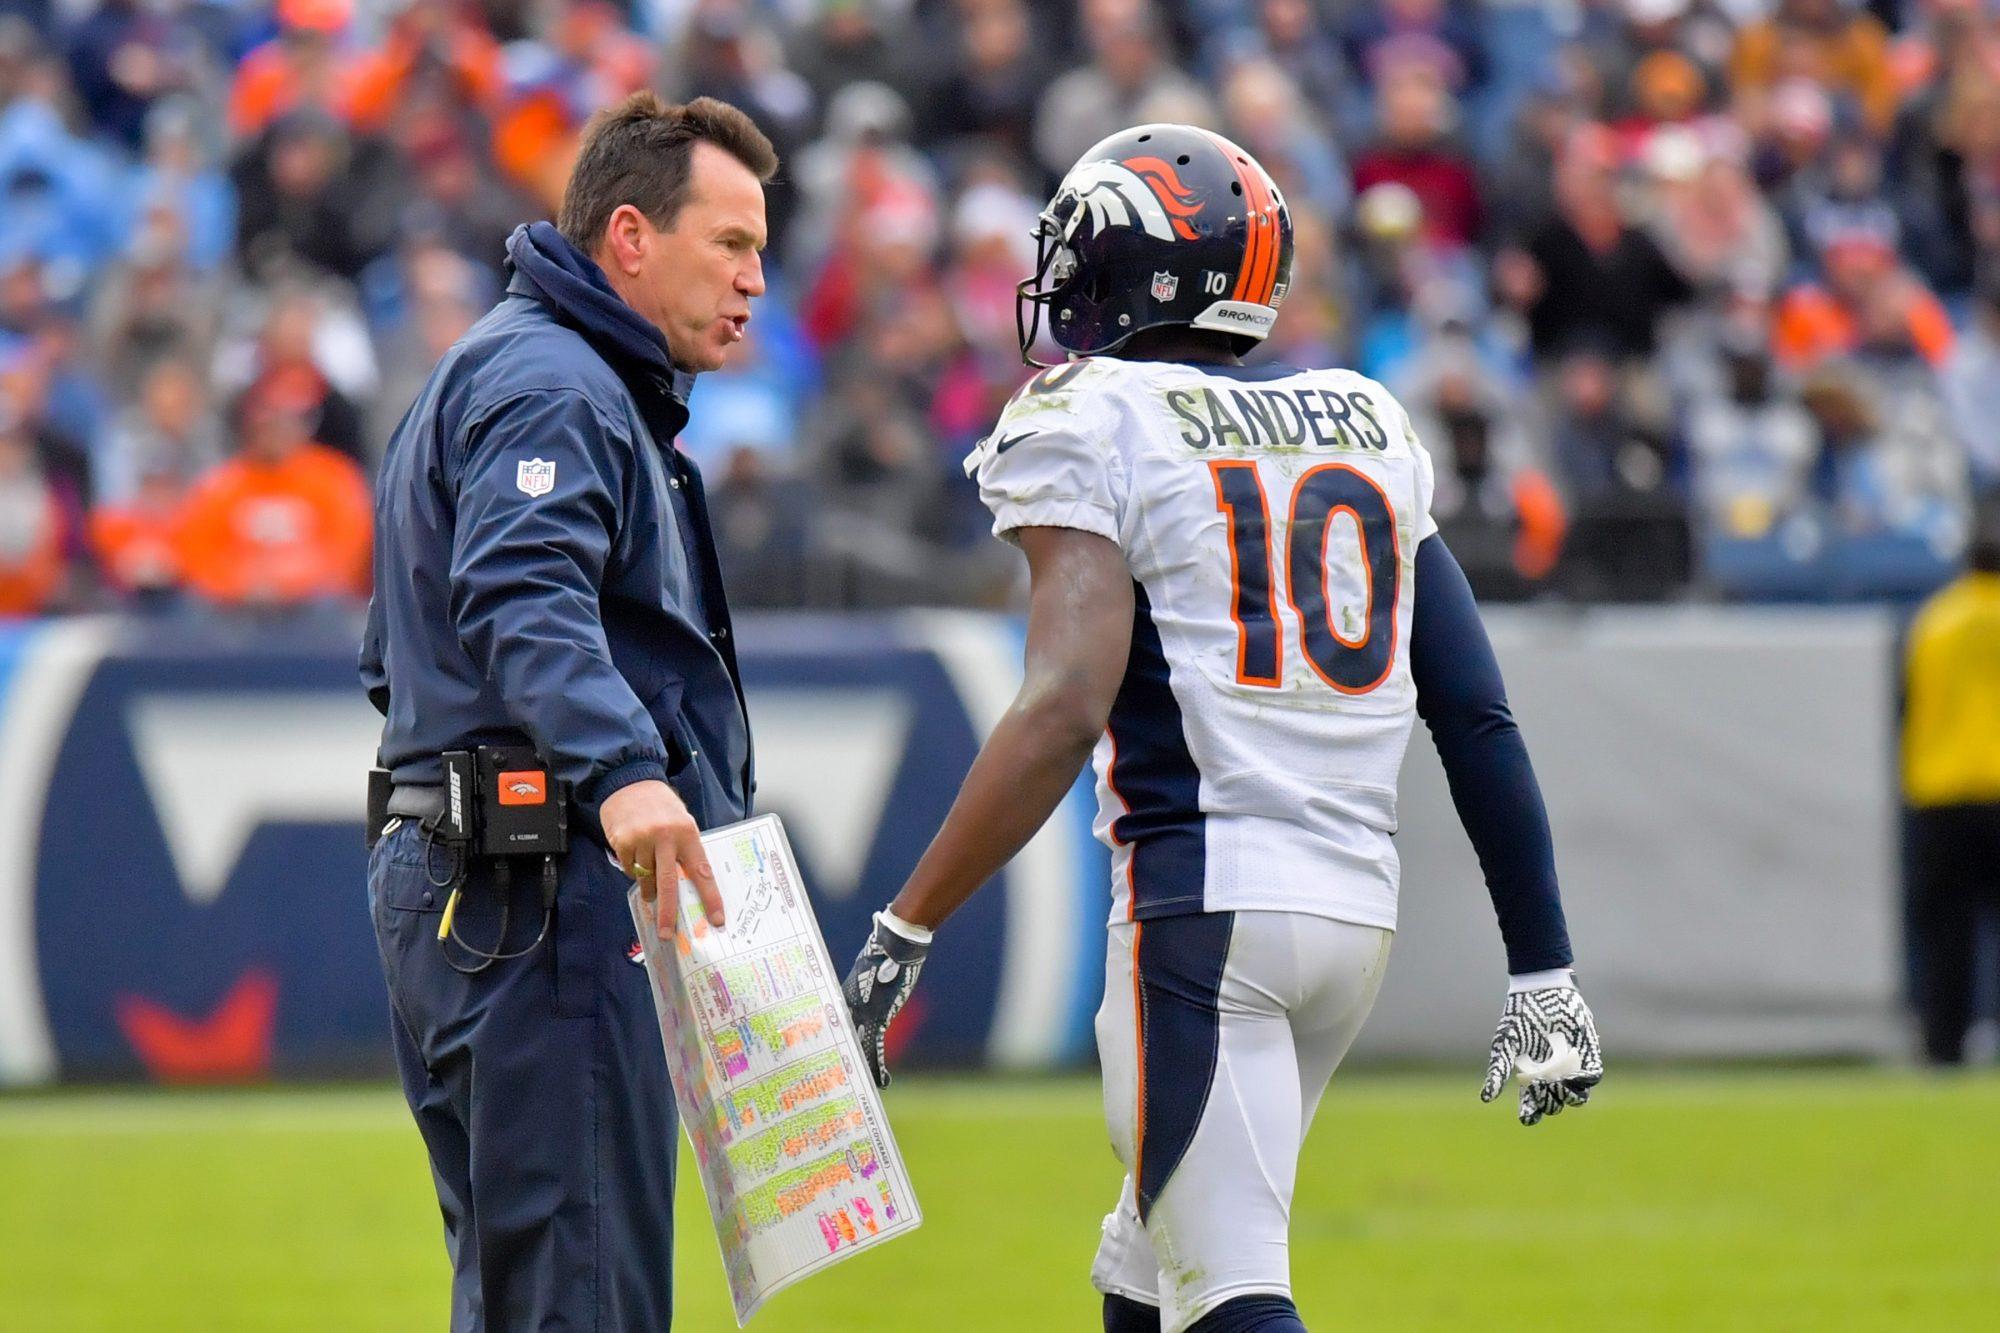 Emmanuel Sanders missed practice to party, lied to Denver Broncos says wife